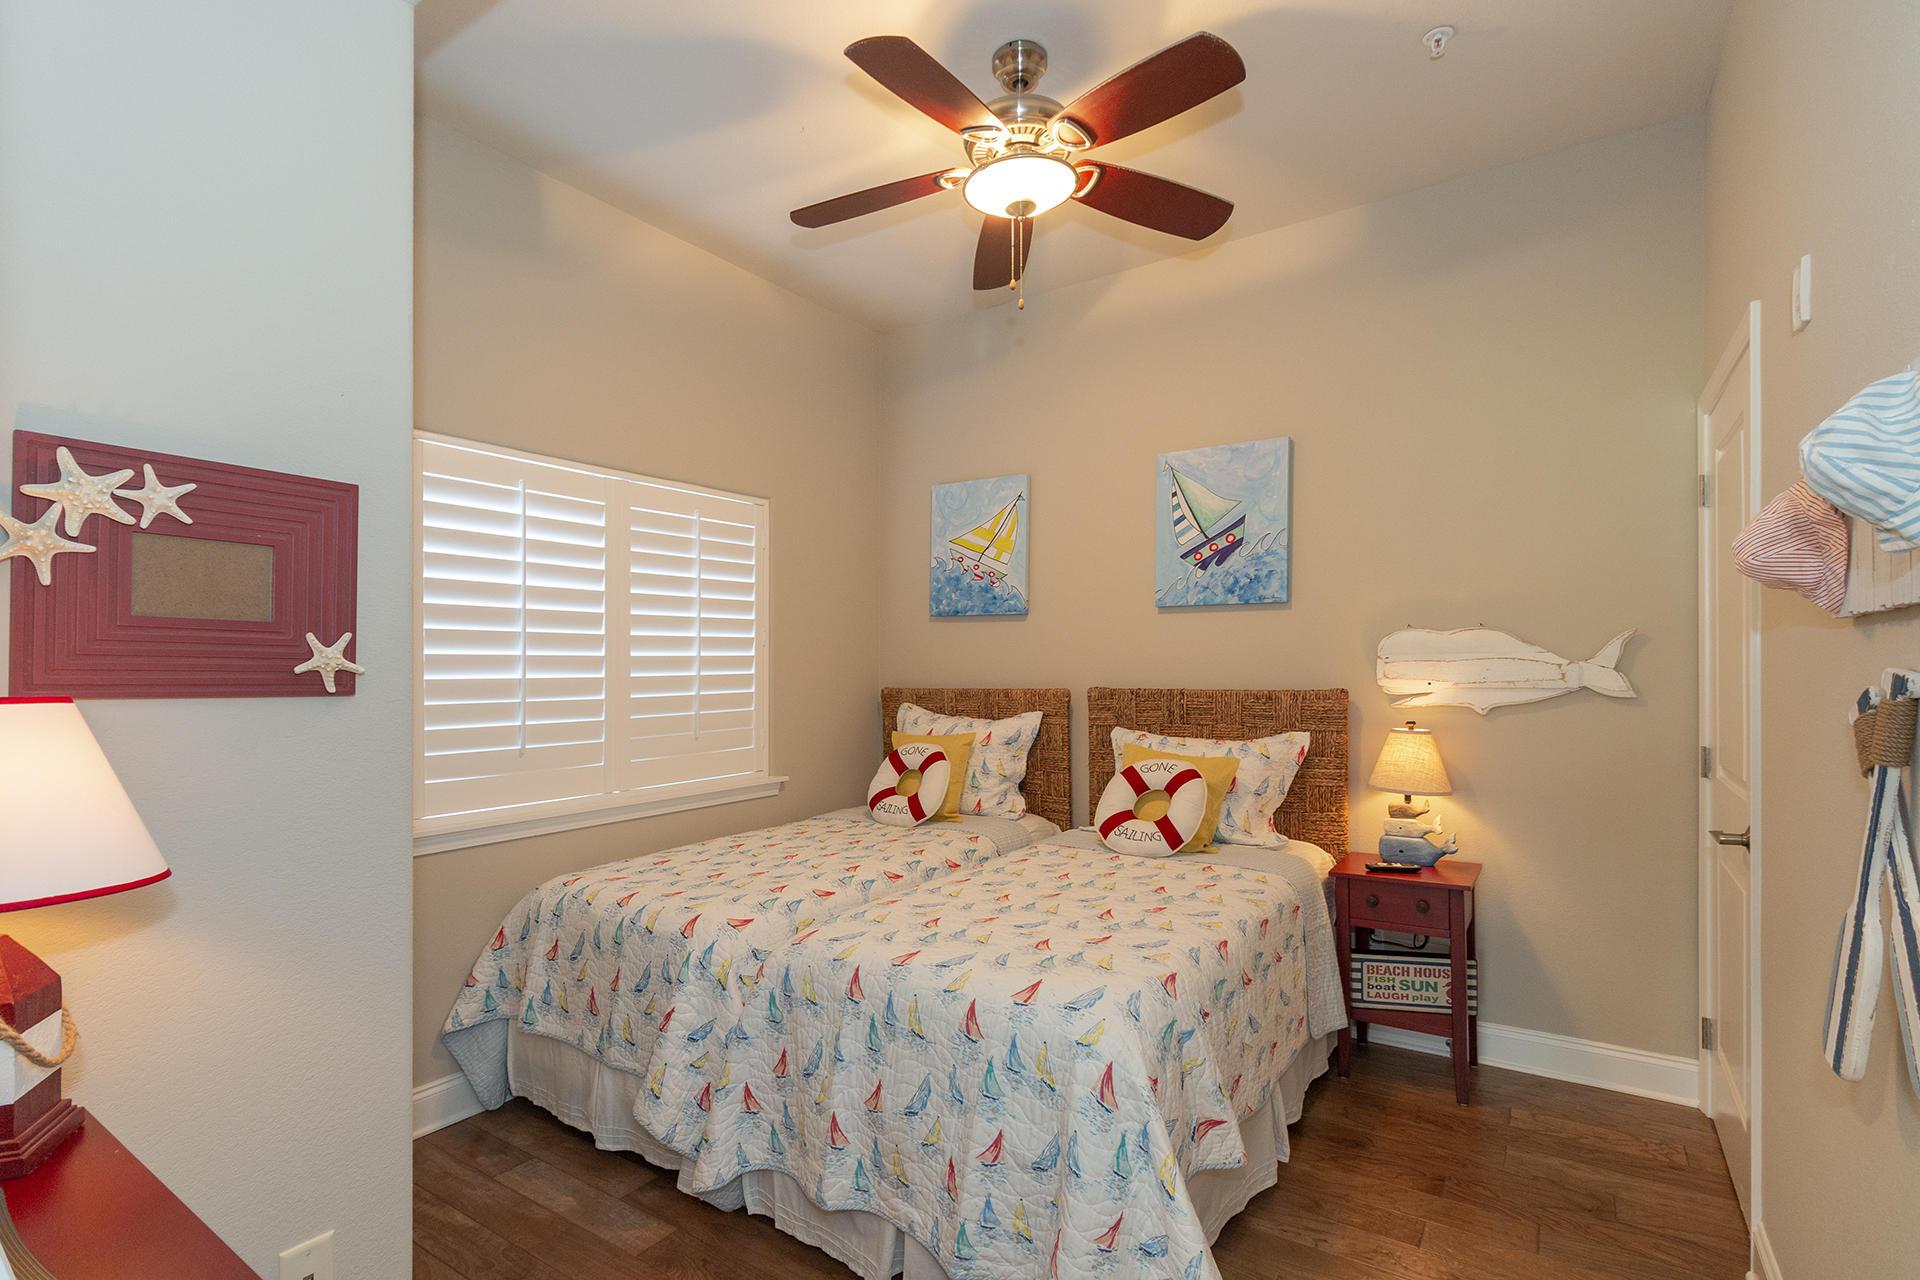 732 Scenic Gulf Drive - $369500